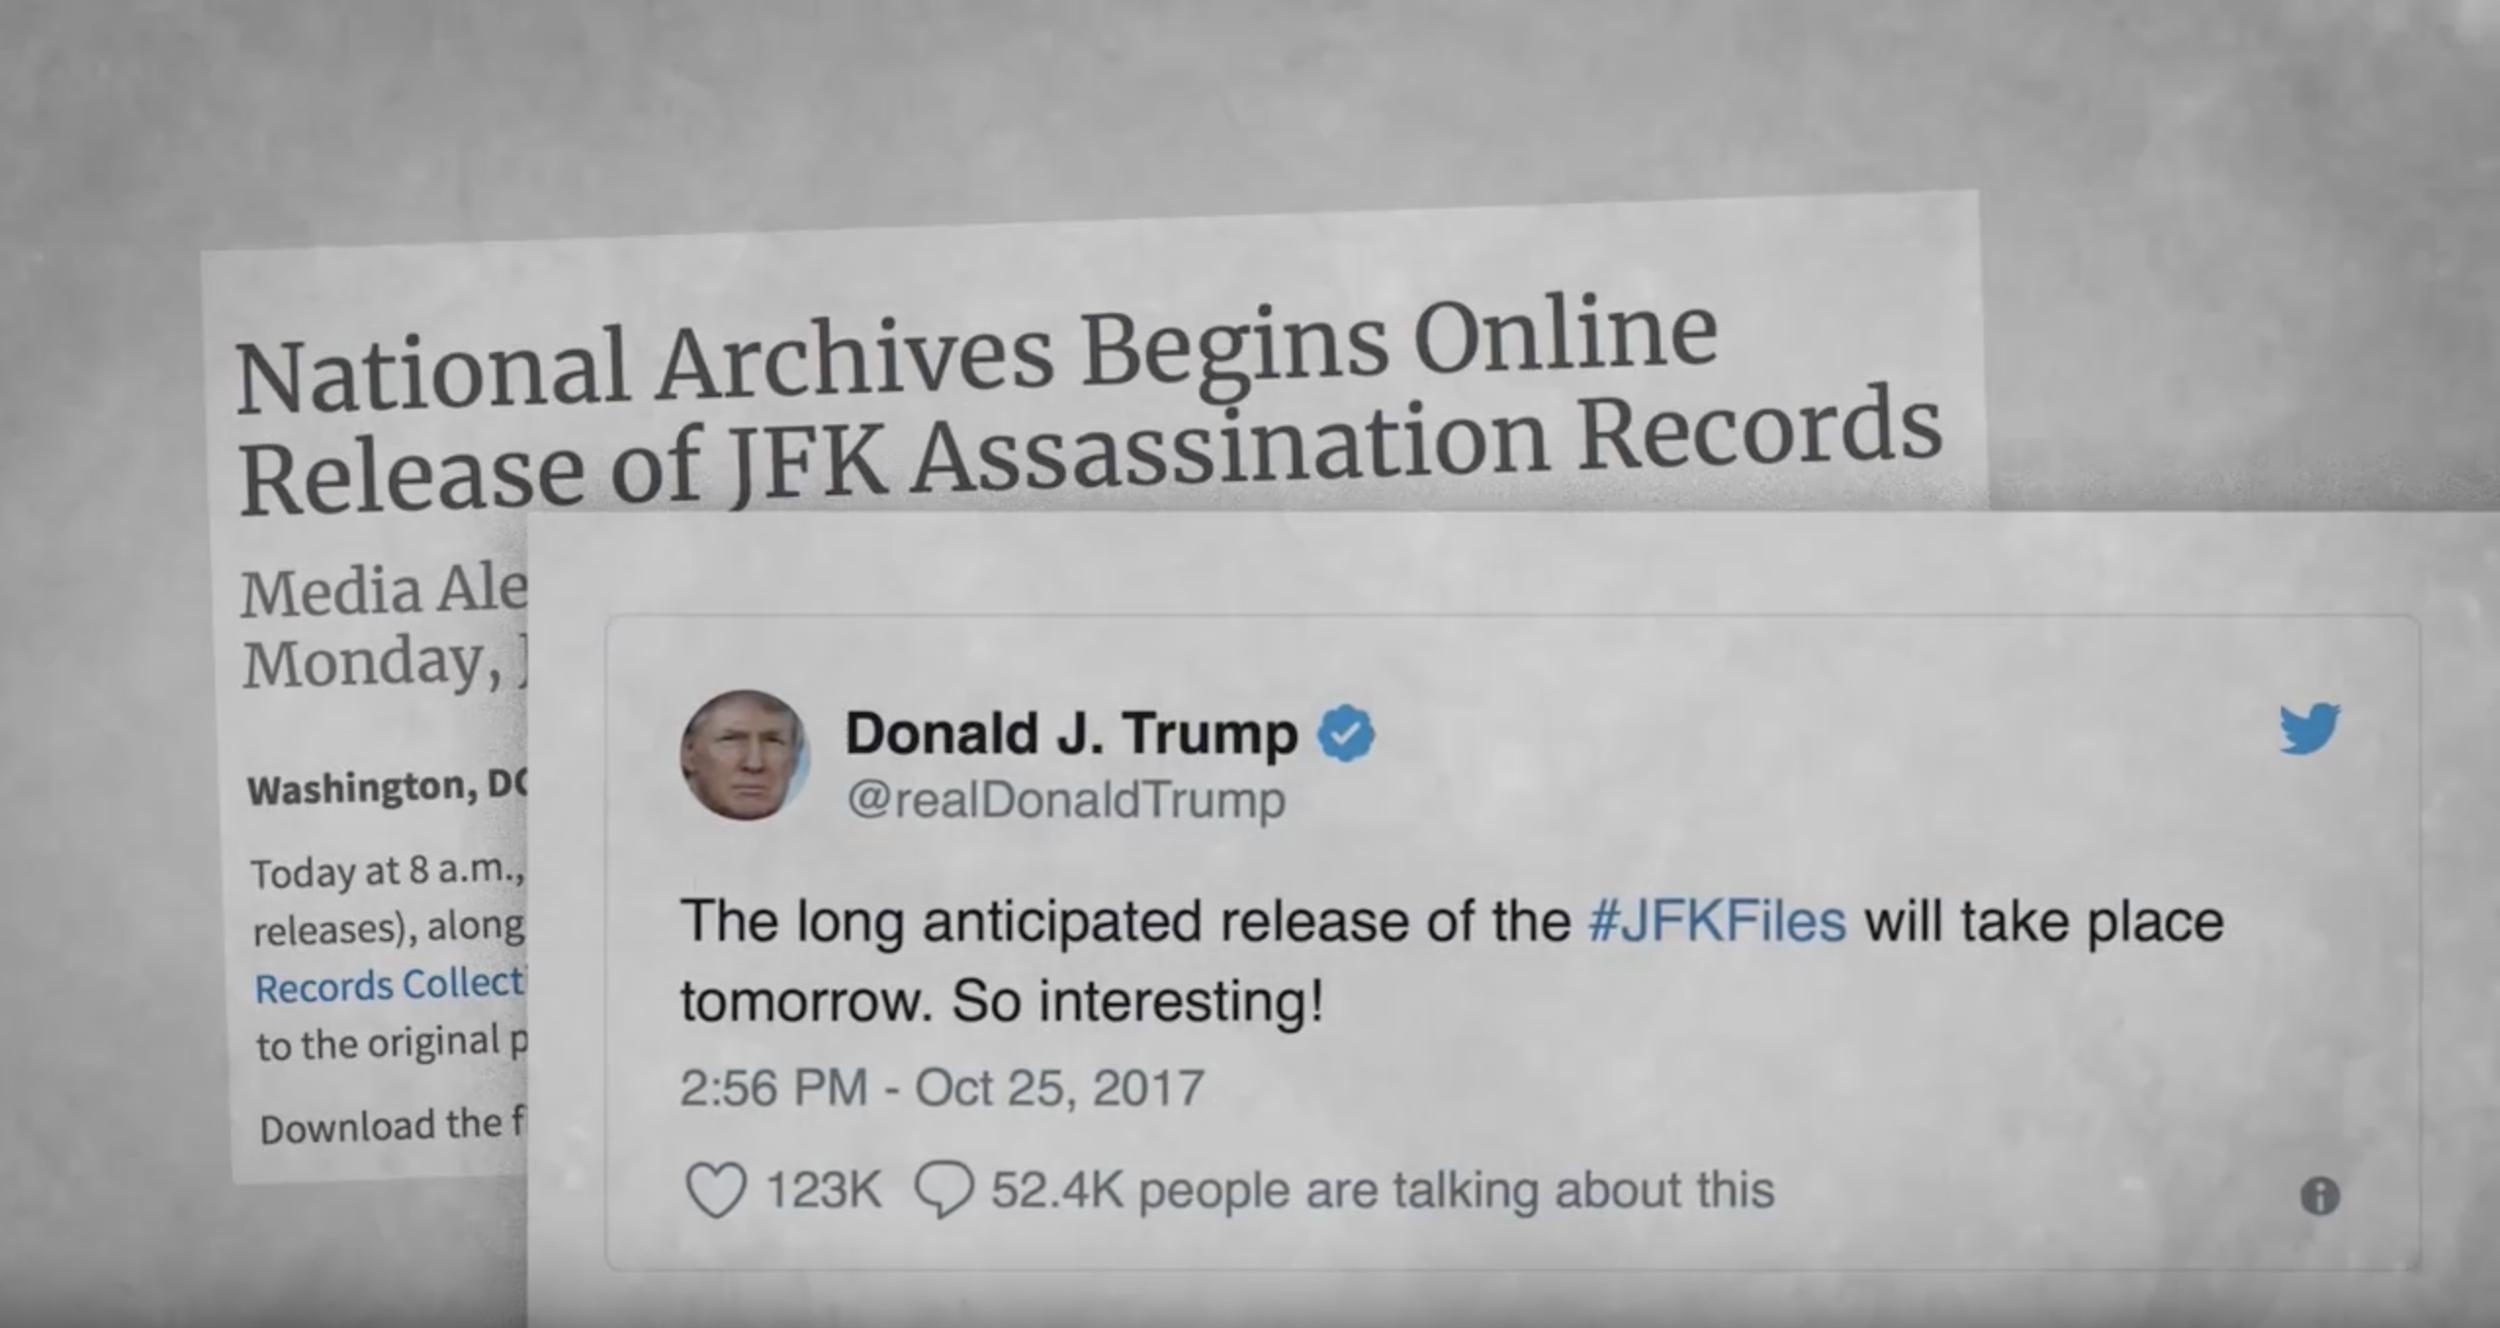 Screenshot 2019-02-18 16.09.21.png